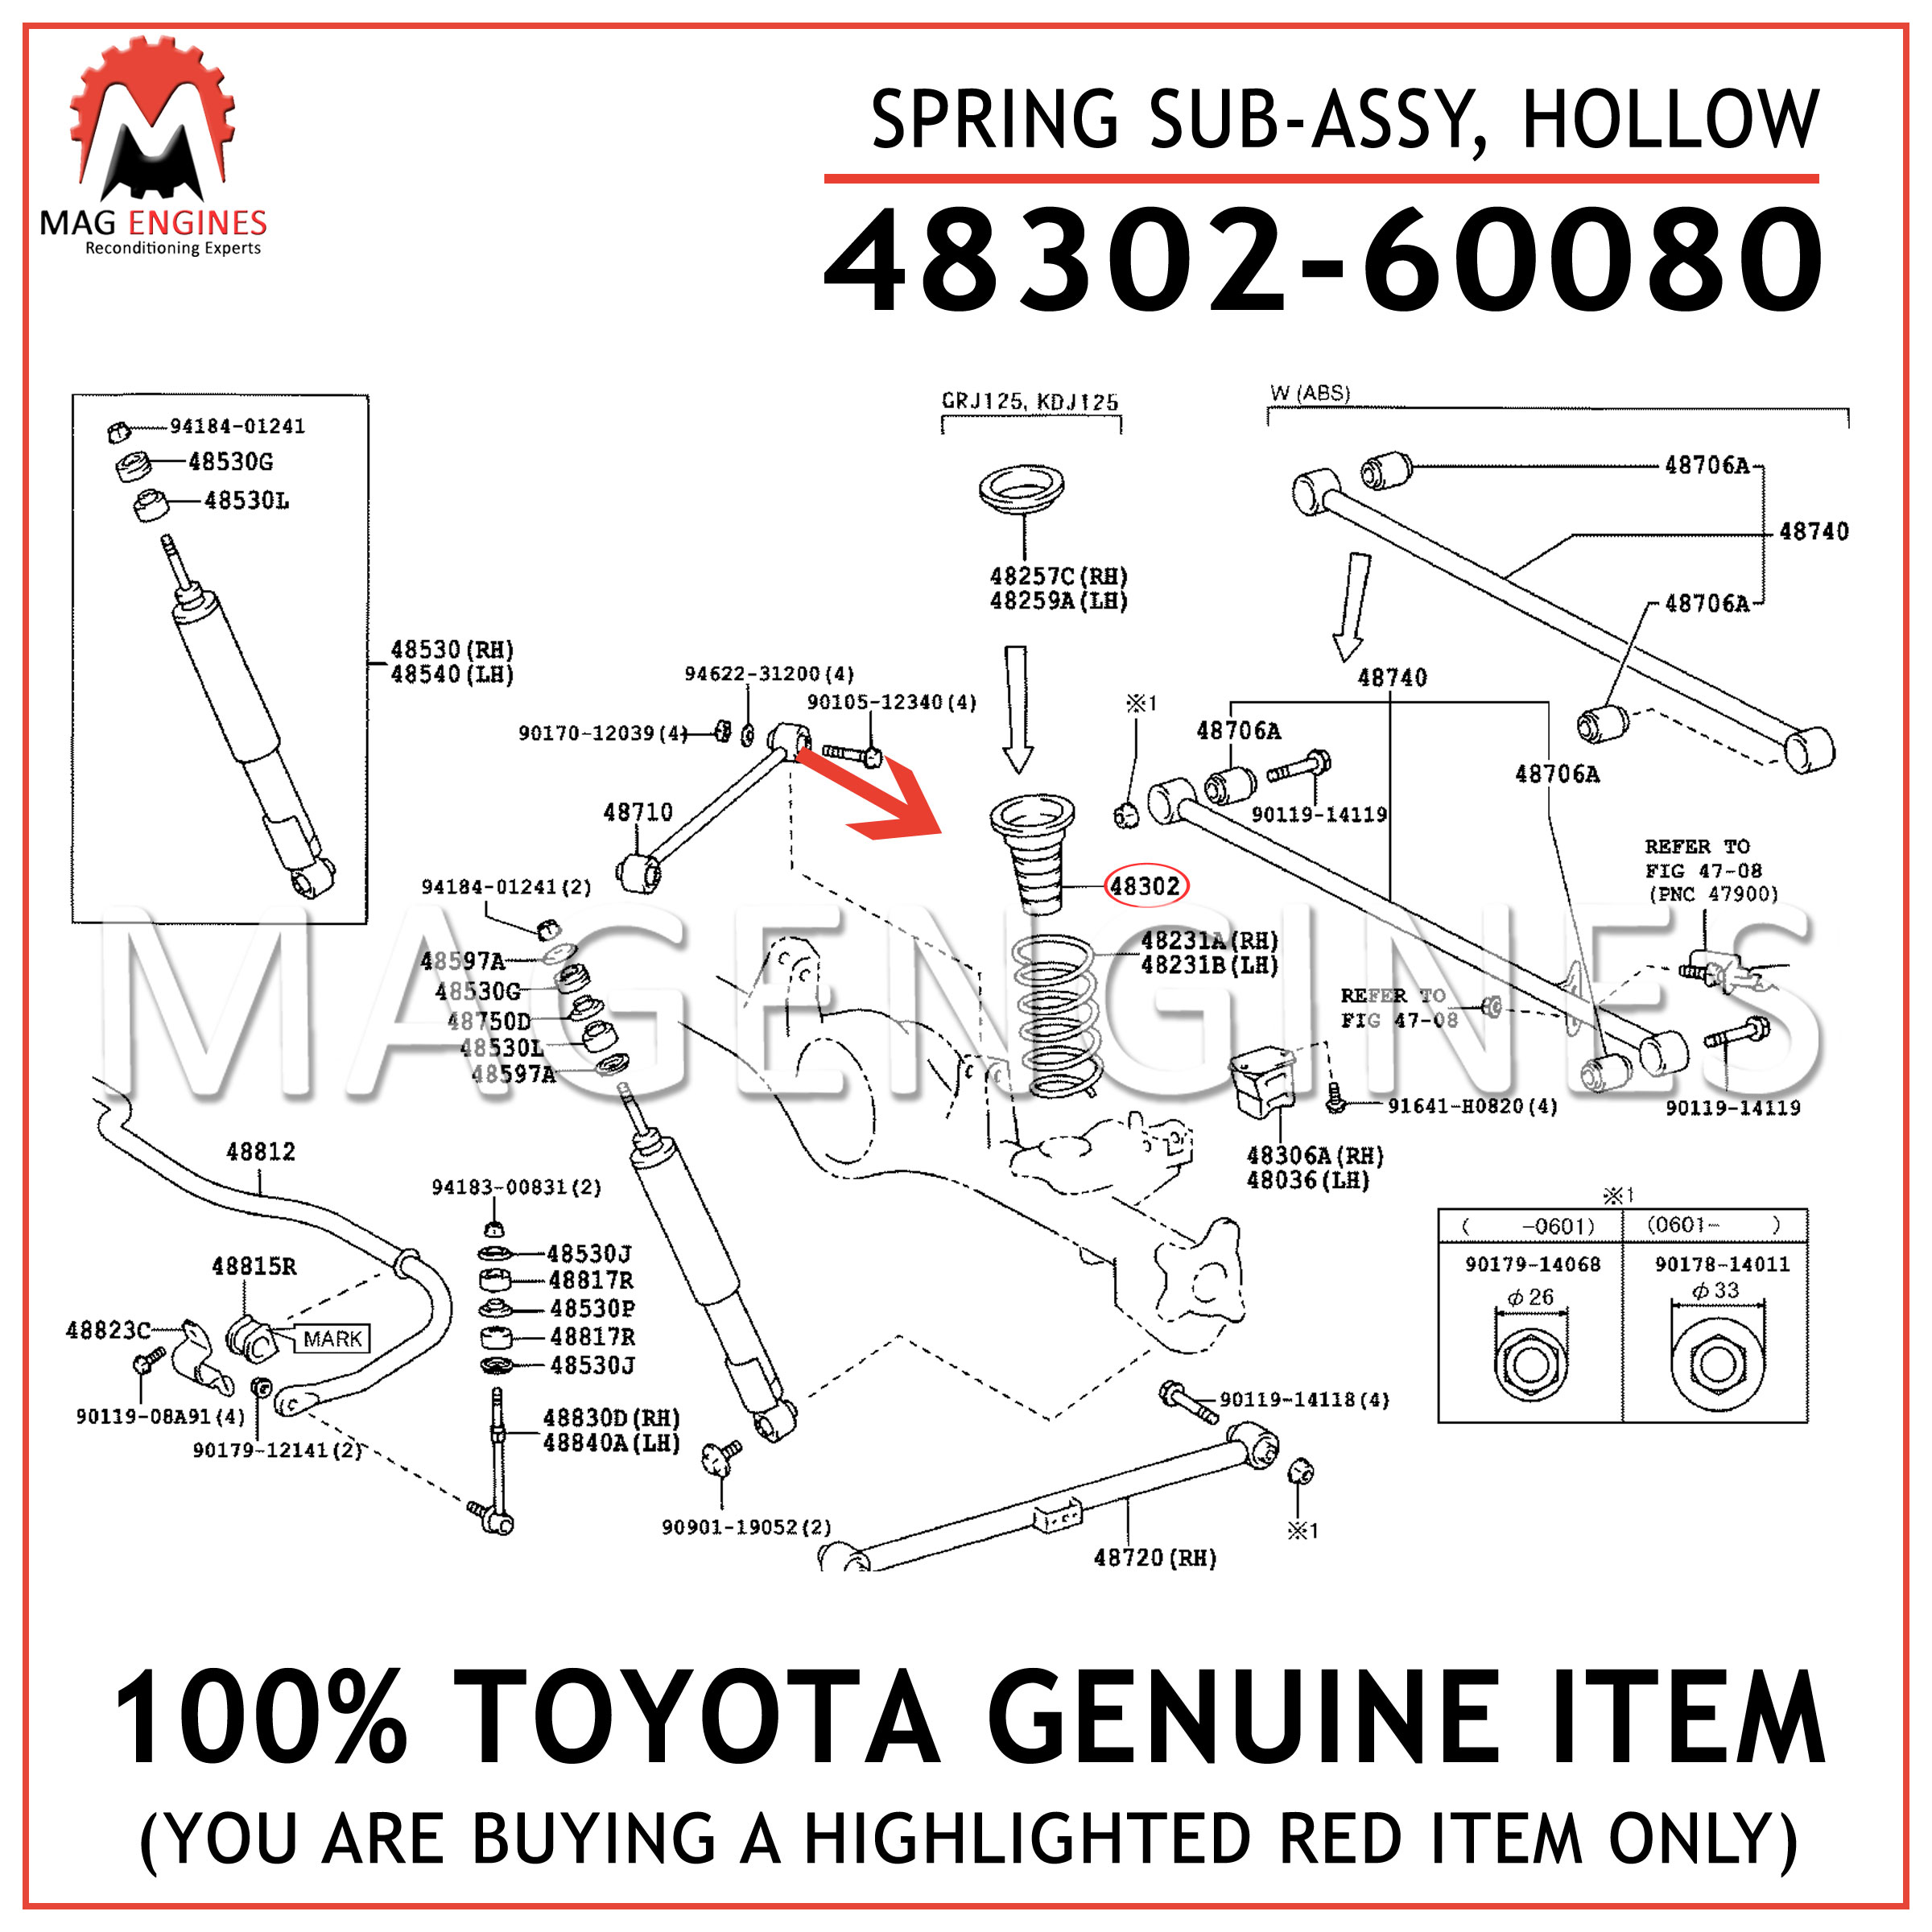 HOLLOW 48302-28010 4830228010 Genuine Toyota SPRING SUB-ASSY